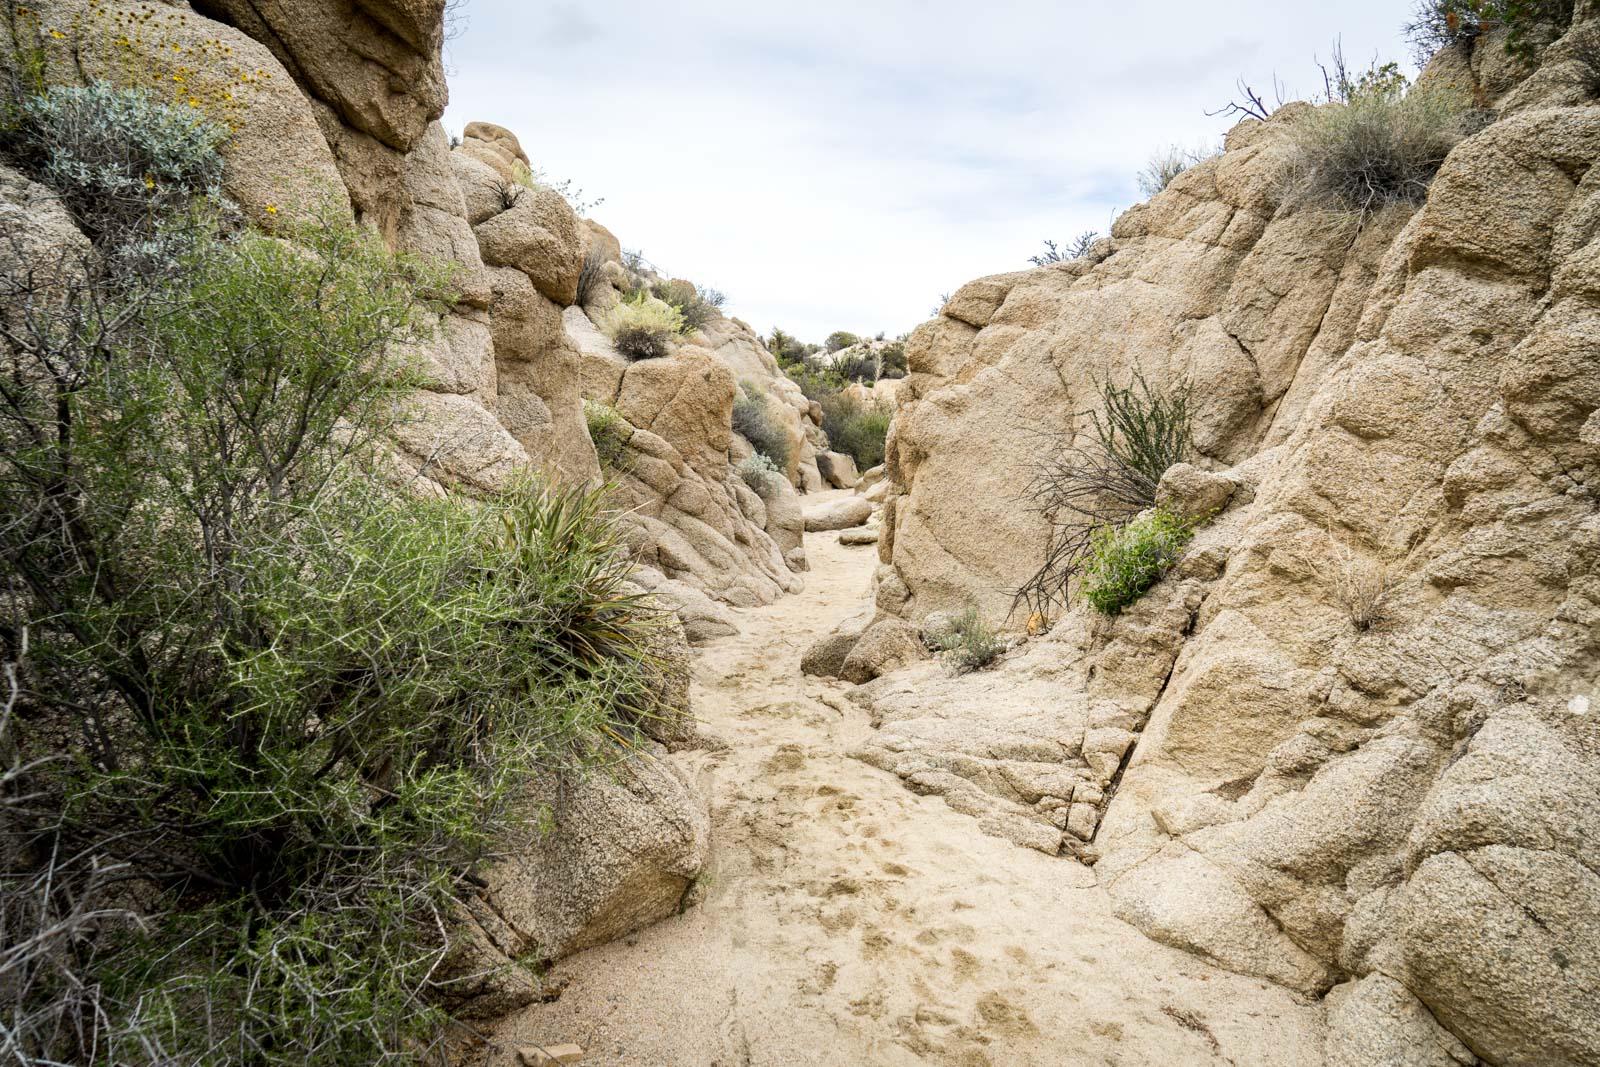 Lost Palms Oasis, Joshua Tree National Park, California, USA